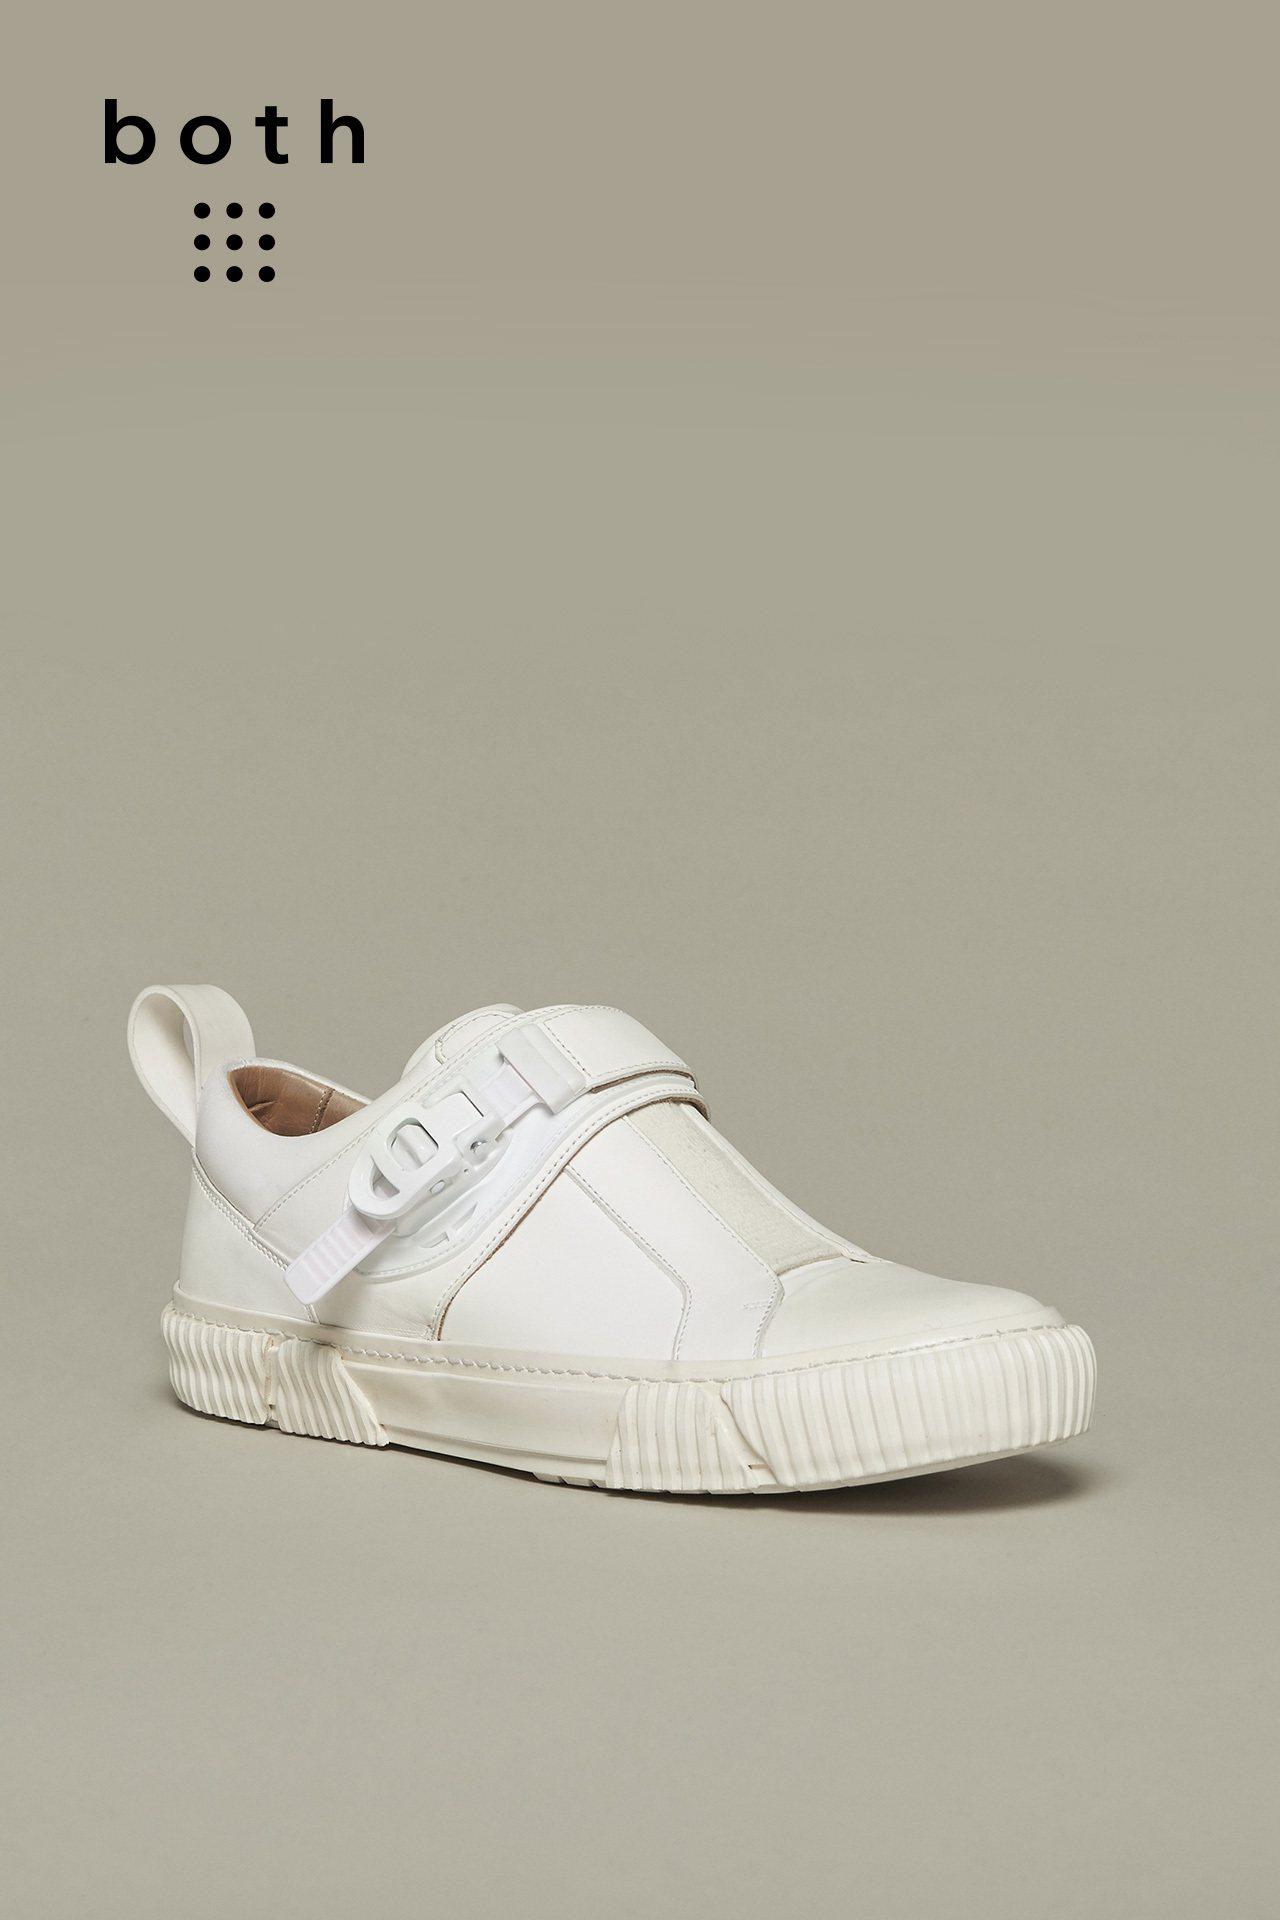 both 白色低筒鞋釦裝飾款(Artifacts),NT$14,980